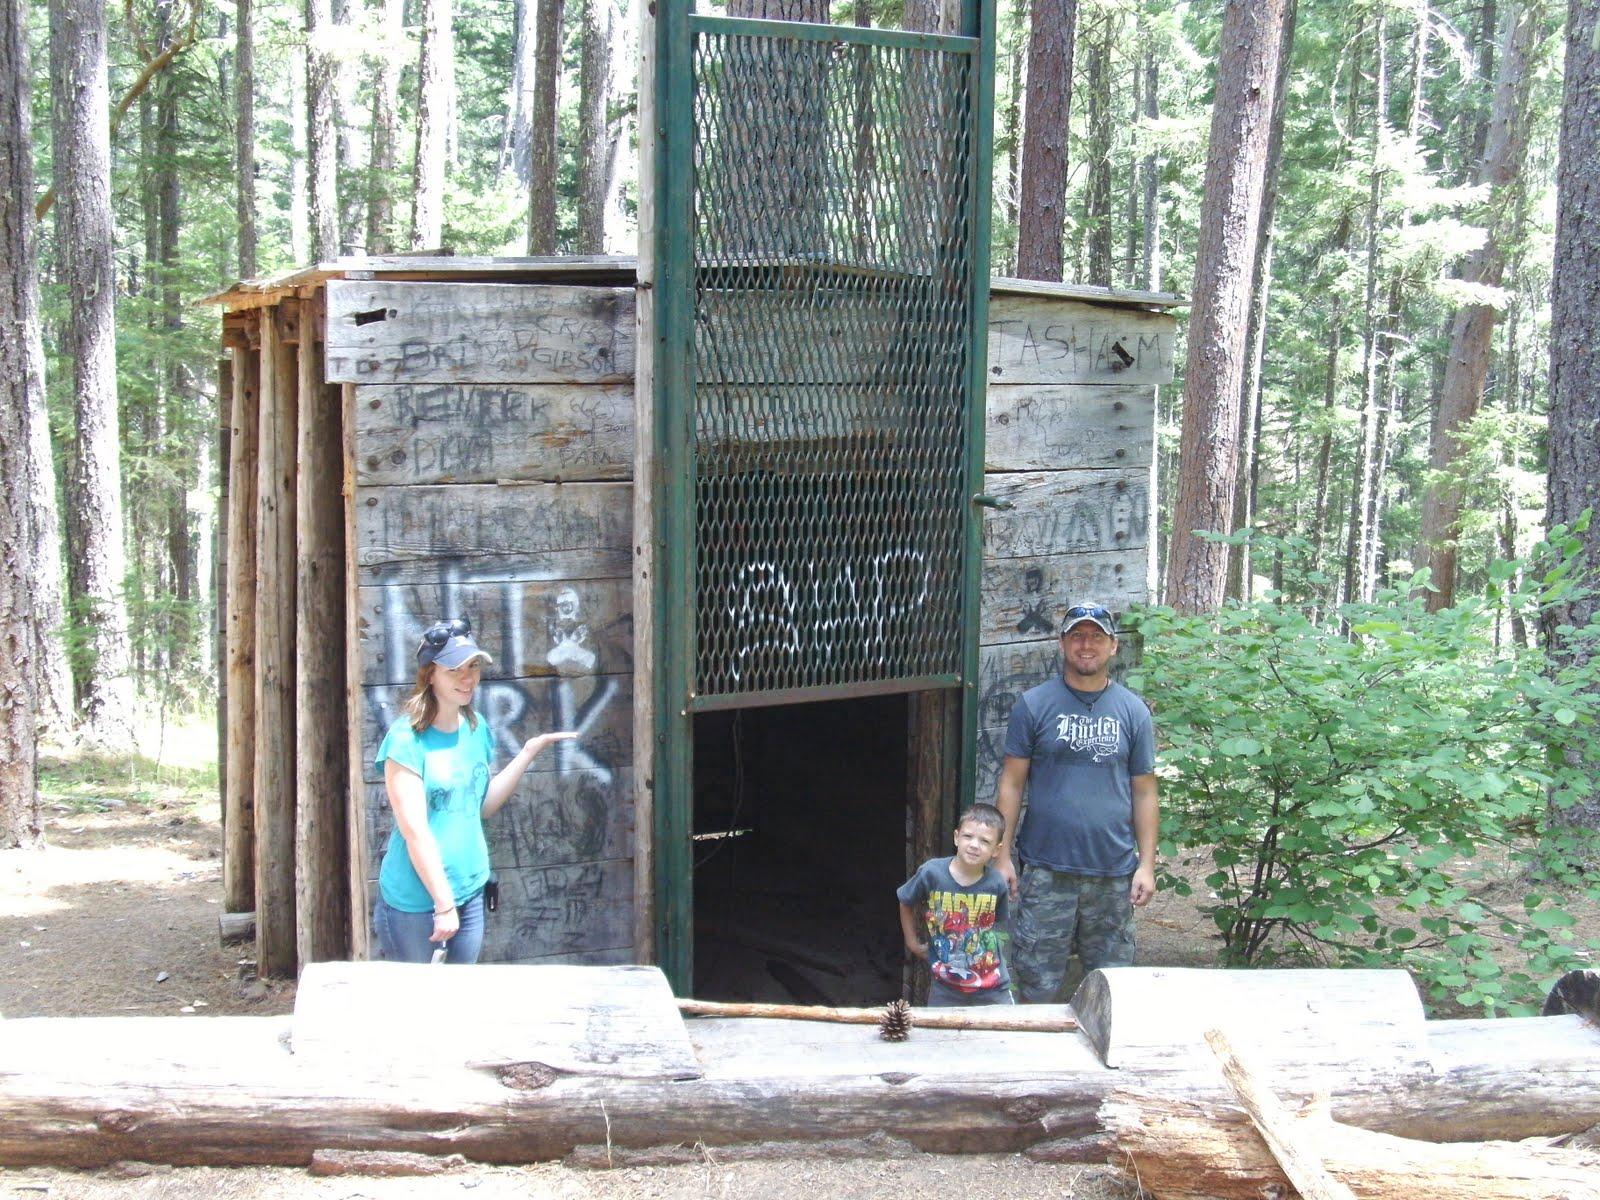 Bigfoot Trap Oregon - Tourists